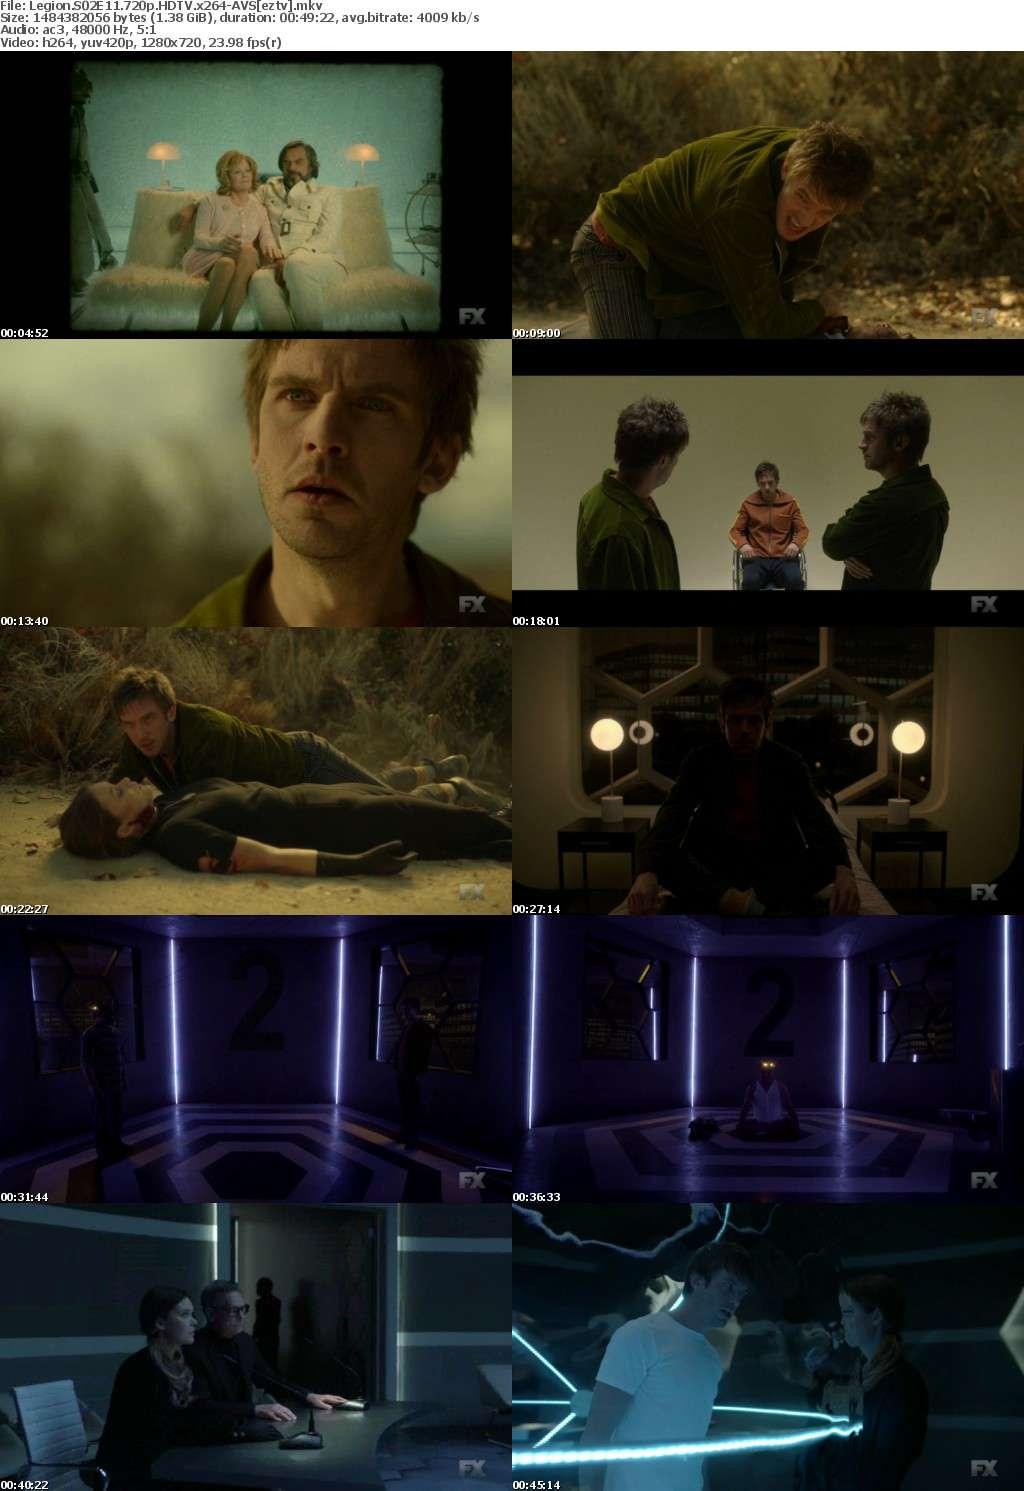 Legion S02E11 720p HDTV x264-AVS